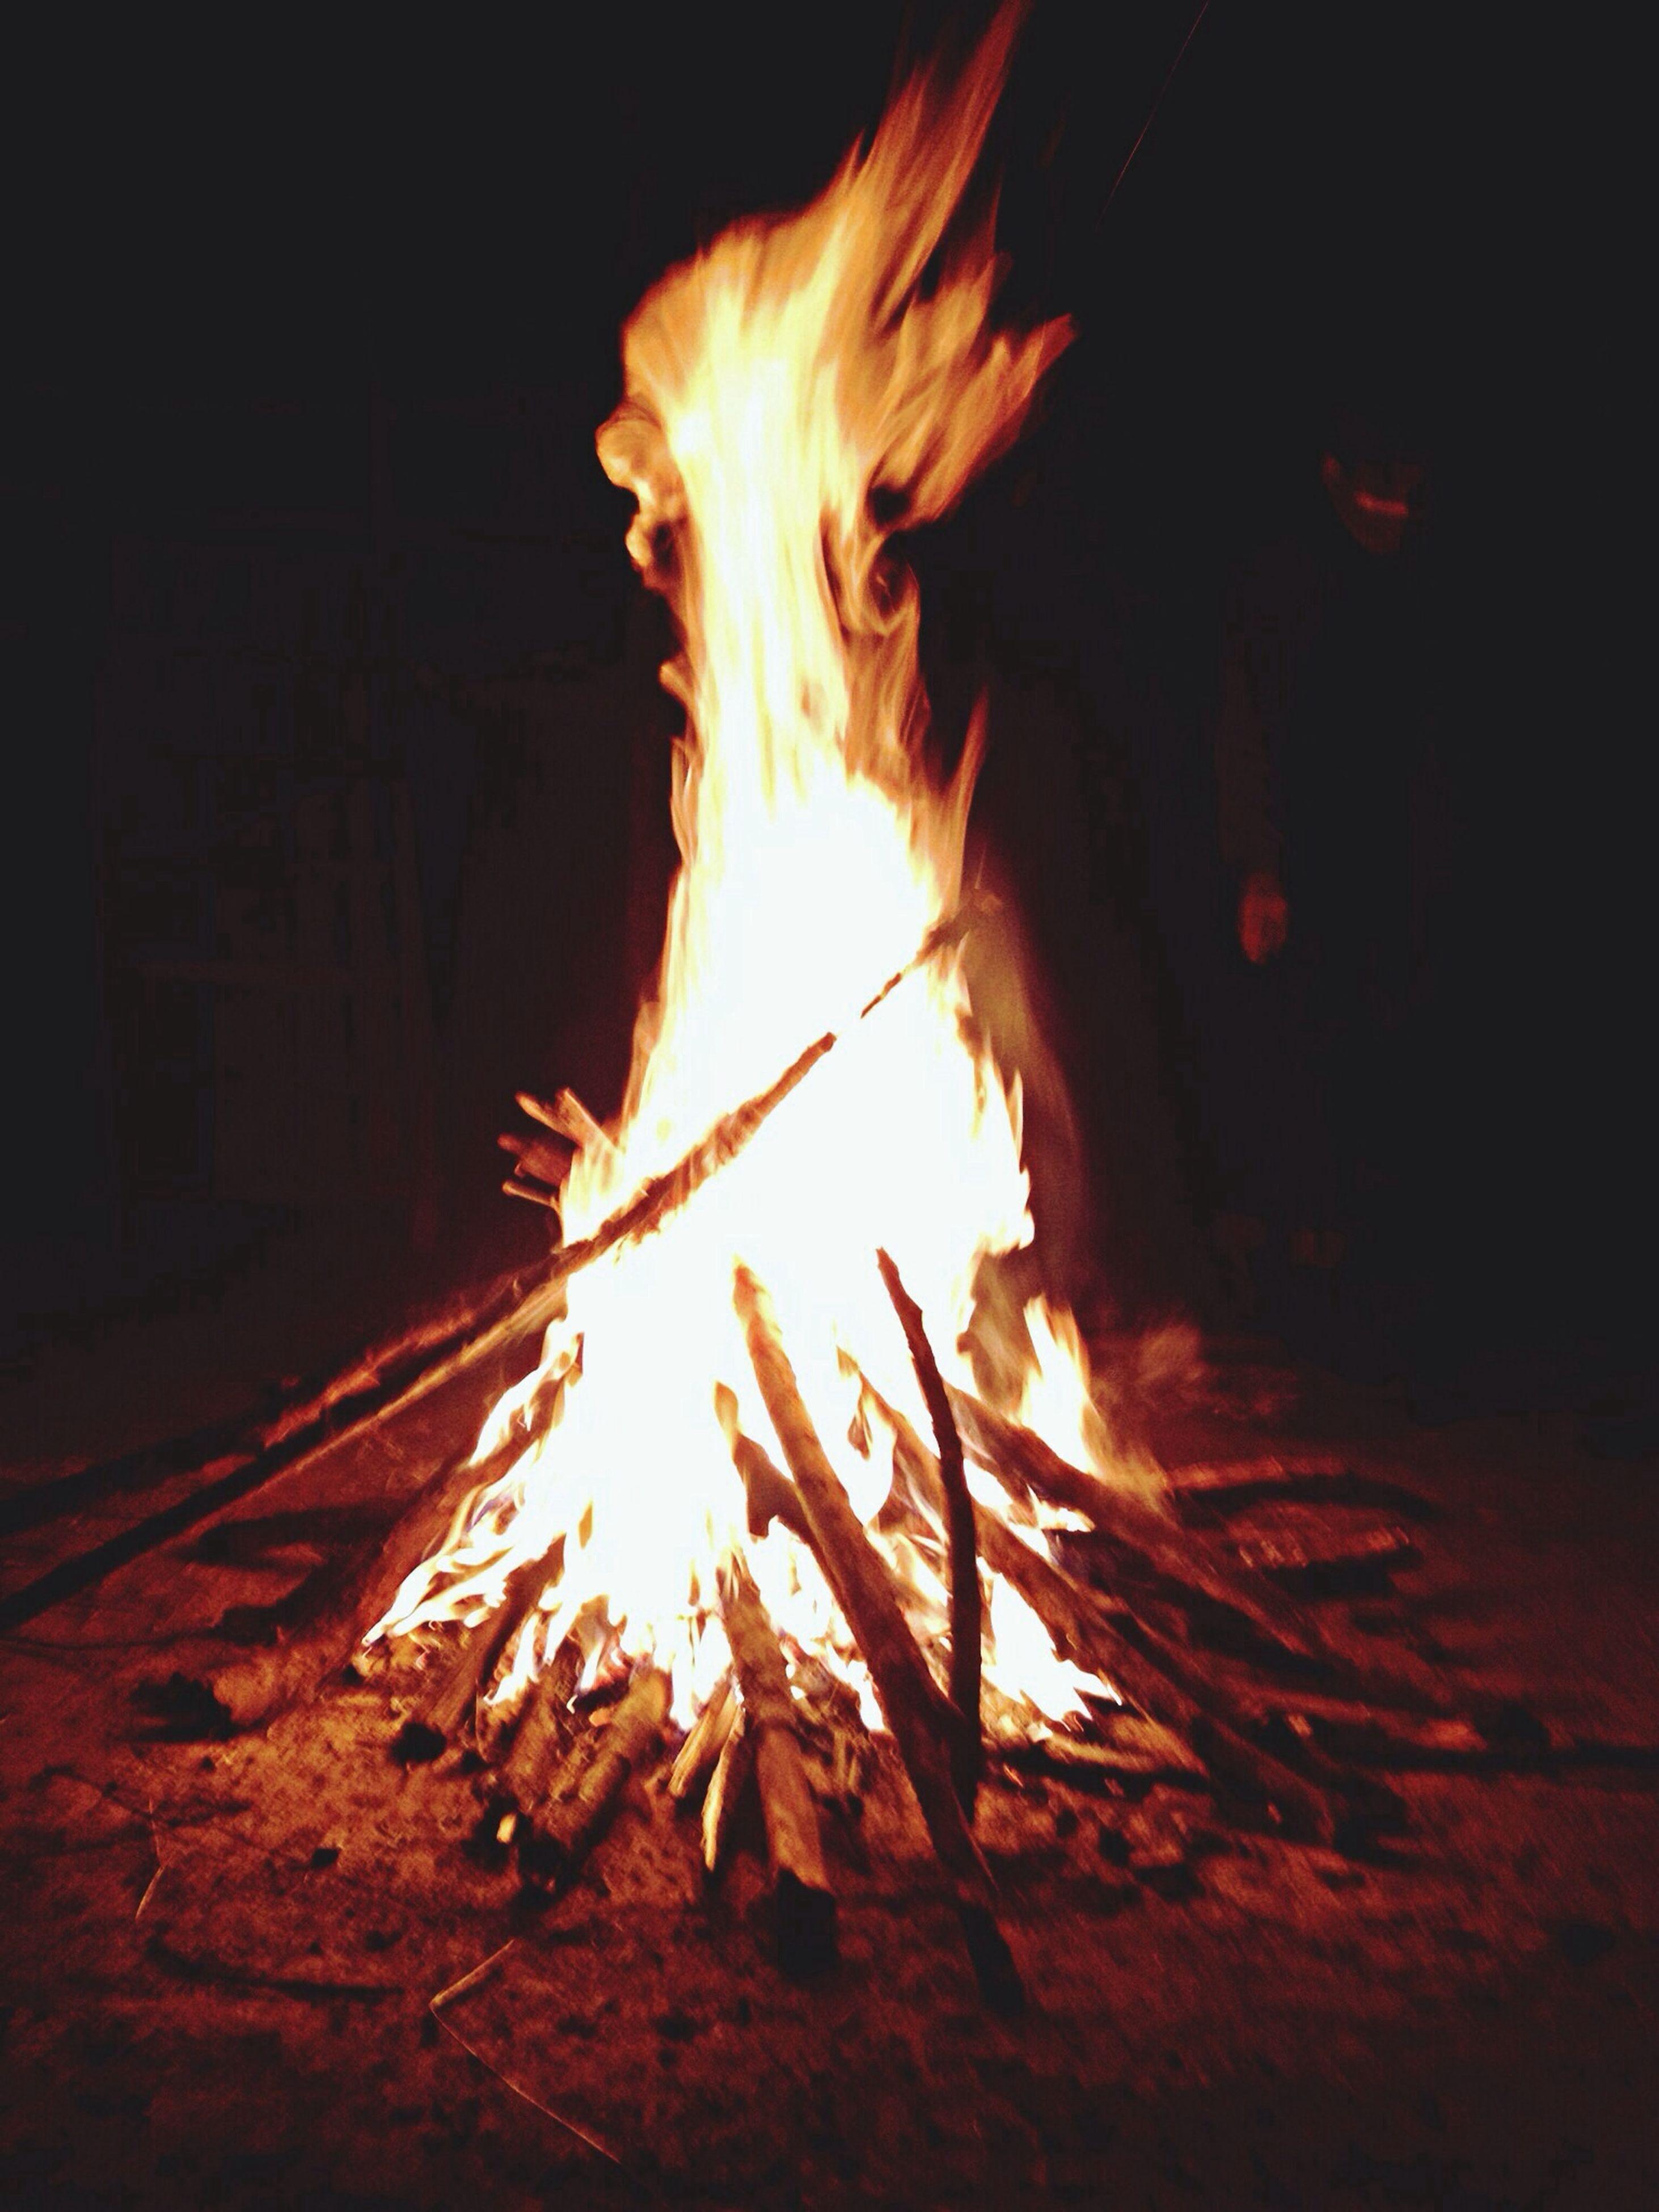 burning, flame, fire - natural phenomenon, heat - temperature, glowing, night, bonfire, fire, firewood, sunlight, sun, close-up, sunbeam, heat, campfire, outdoors, dark, sunset, light - natural phenomenon, lens flare